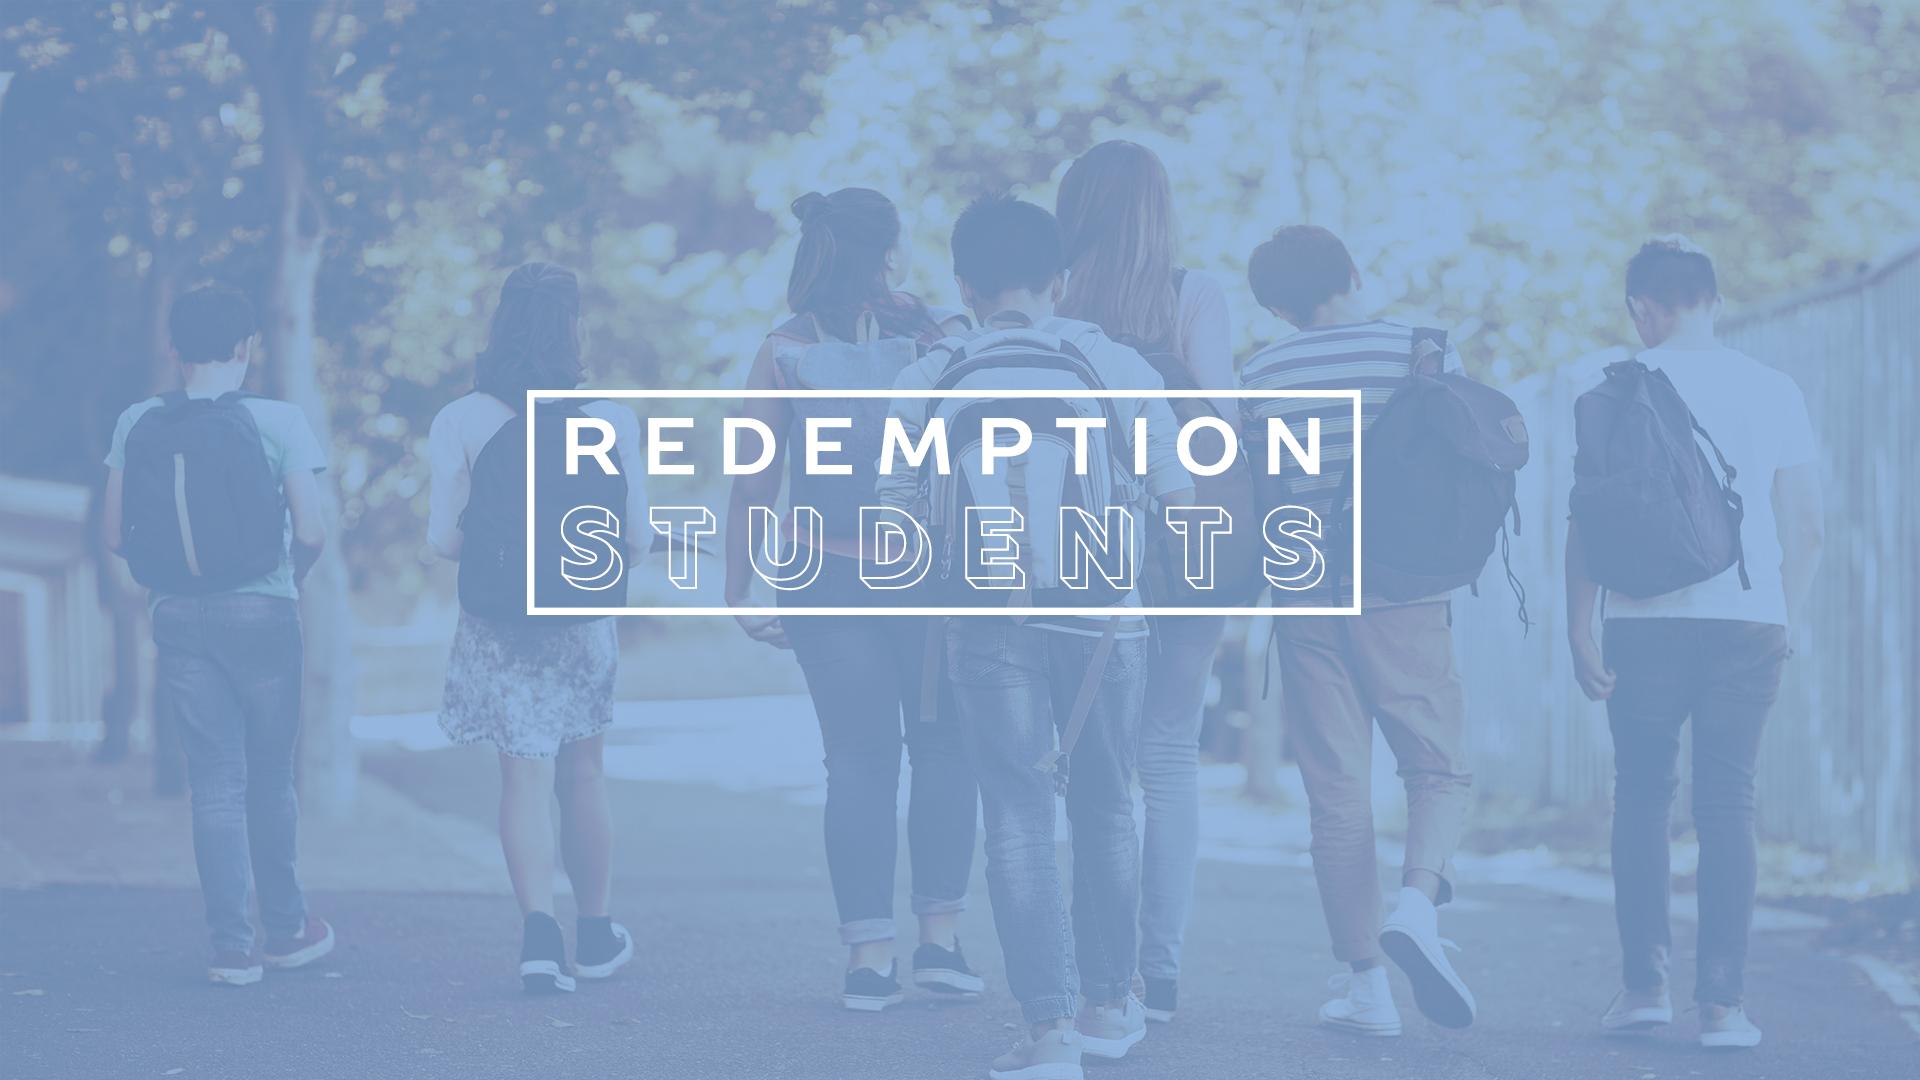 Redemption-Students-LOGO-full-background.jpg